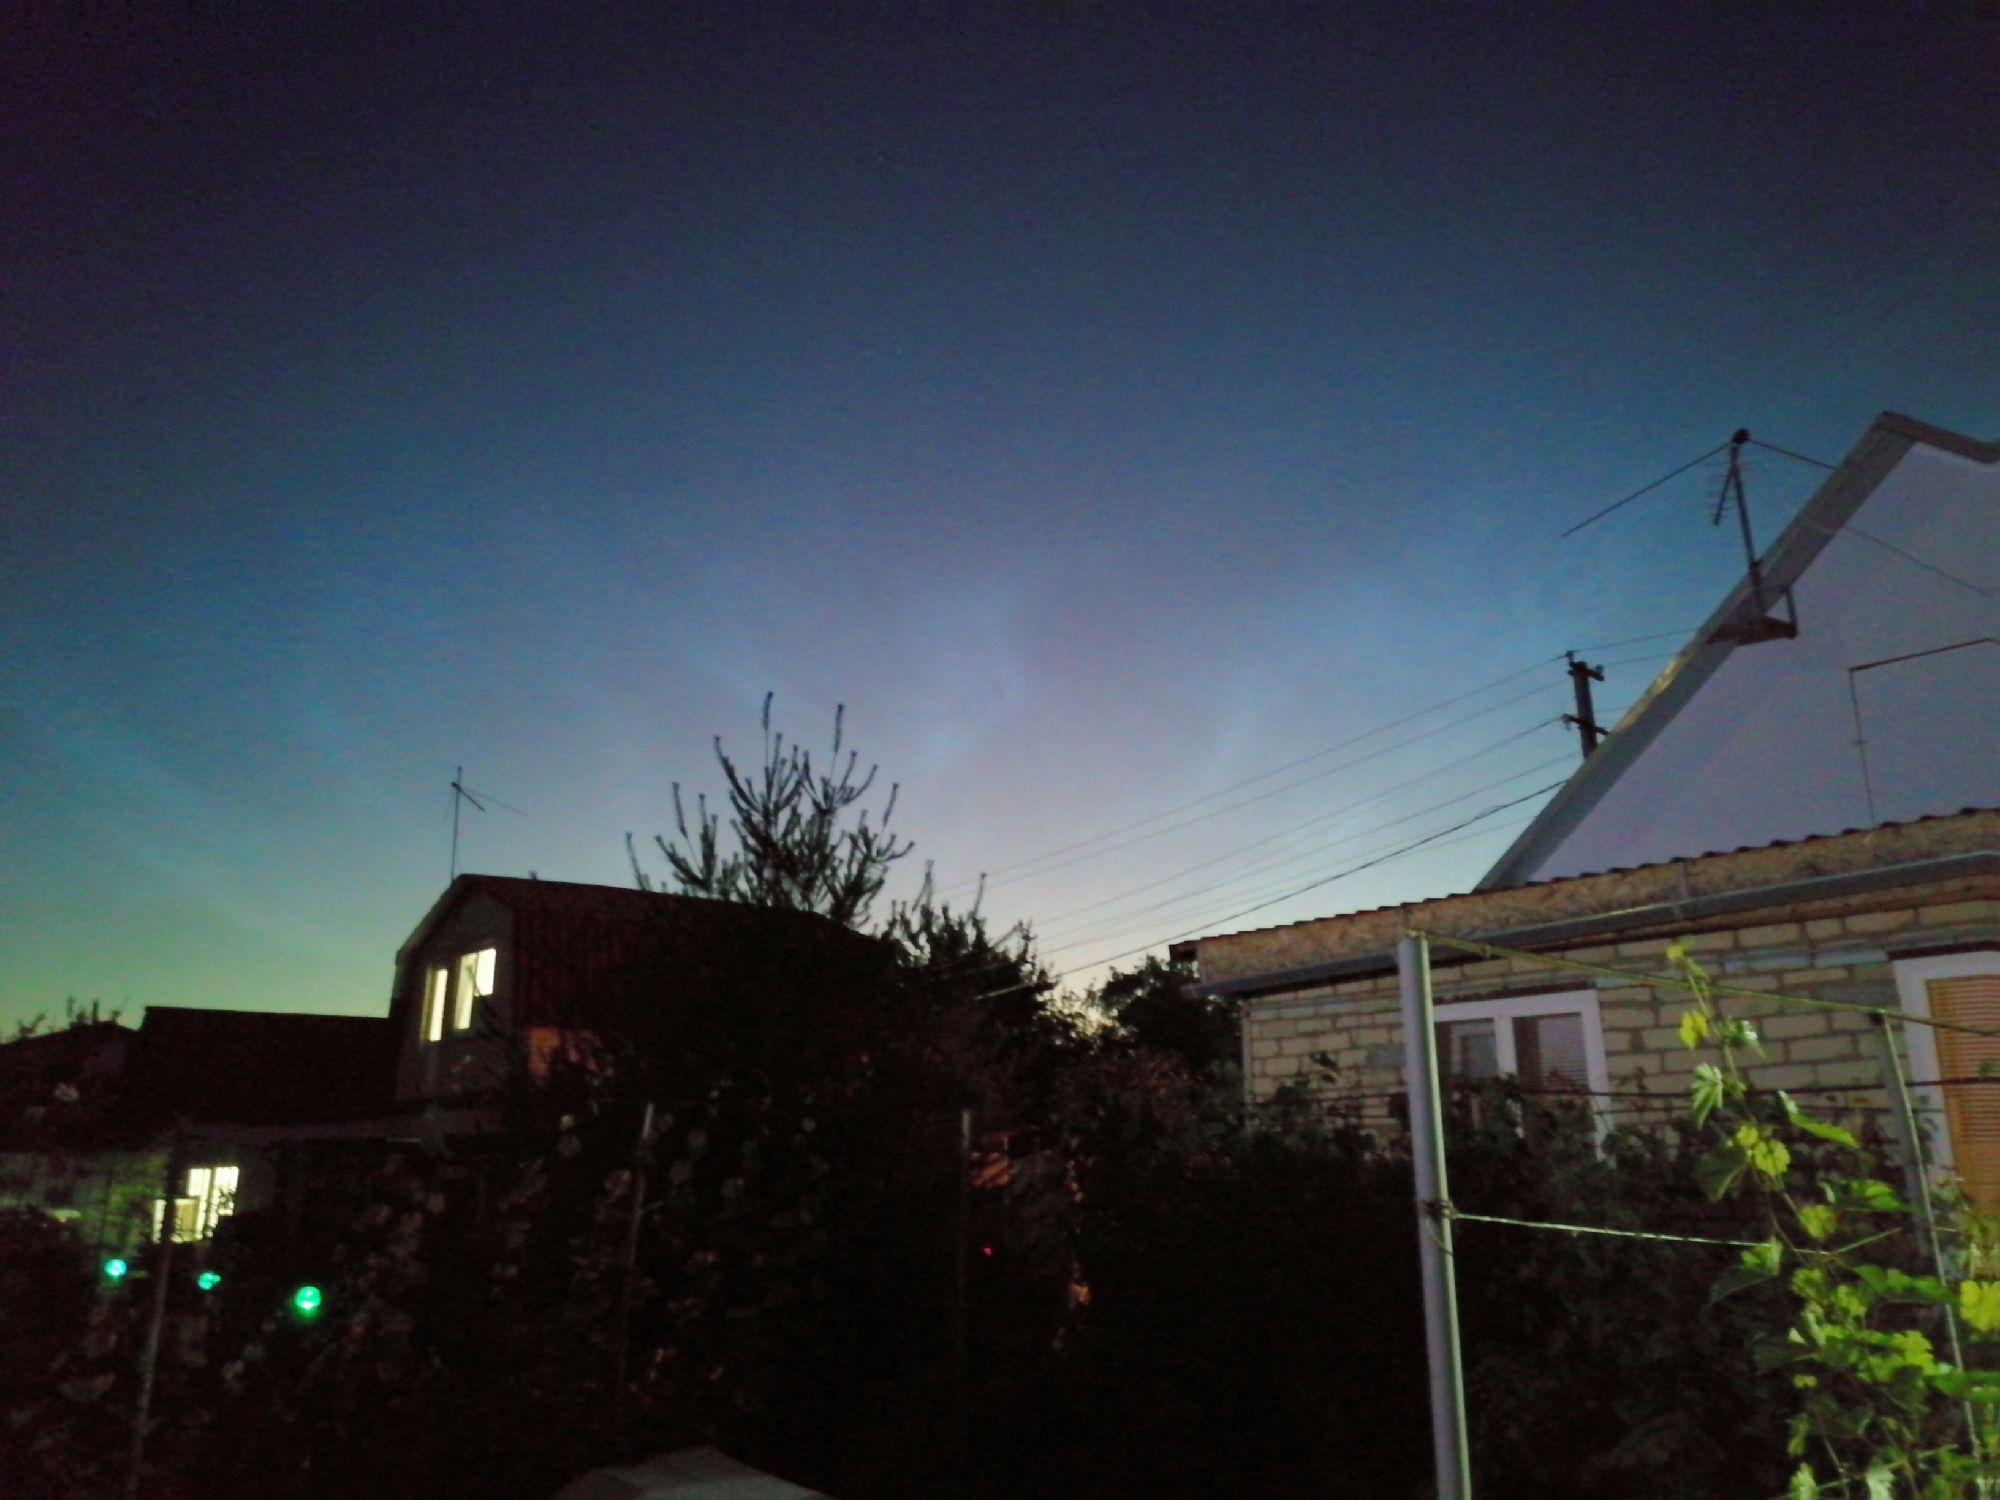 Ночное небо над дачами